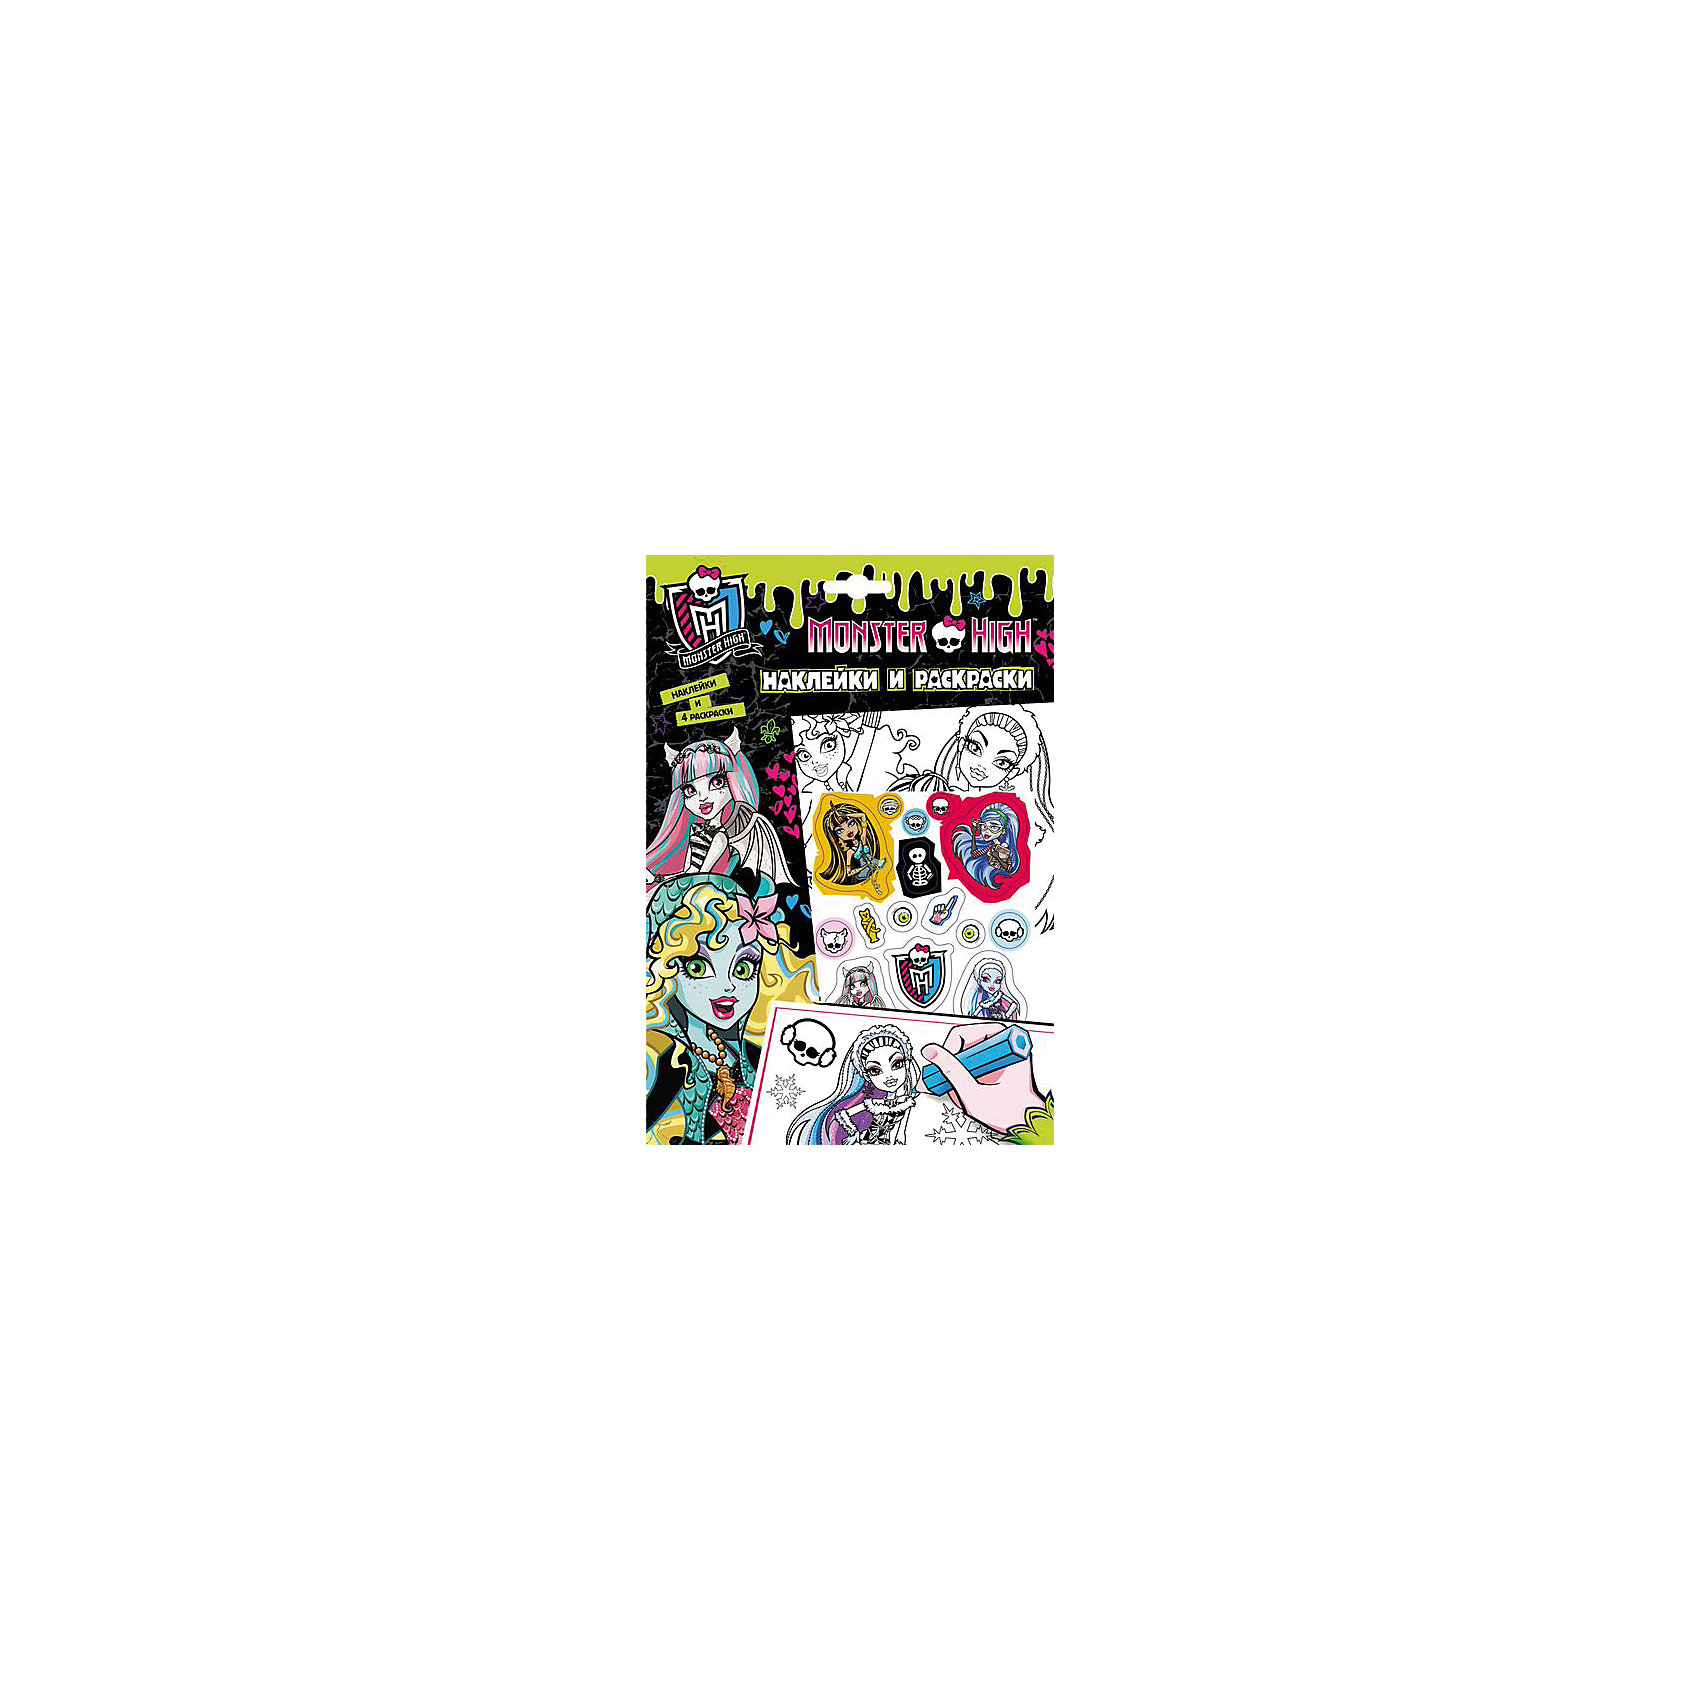 Росмэн Наклейки и раскраски (зеленая), Monster High наклейки плоские для тетрадей monster high 85244